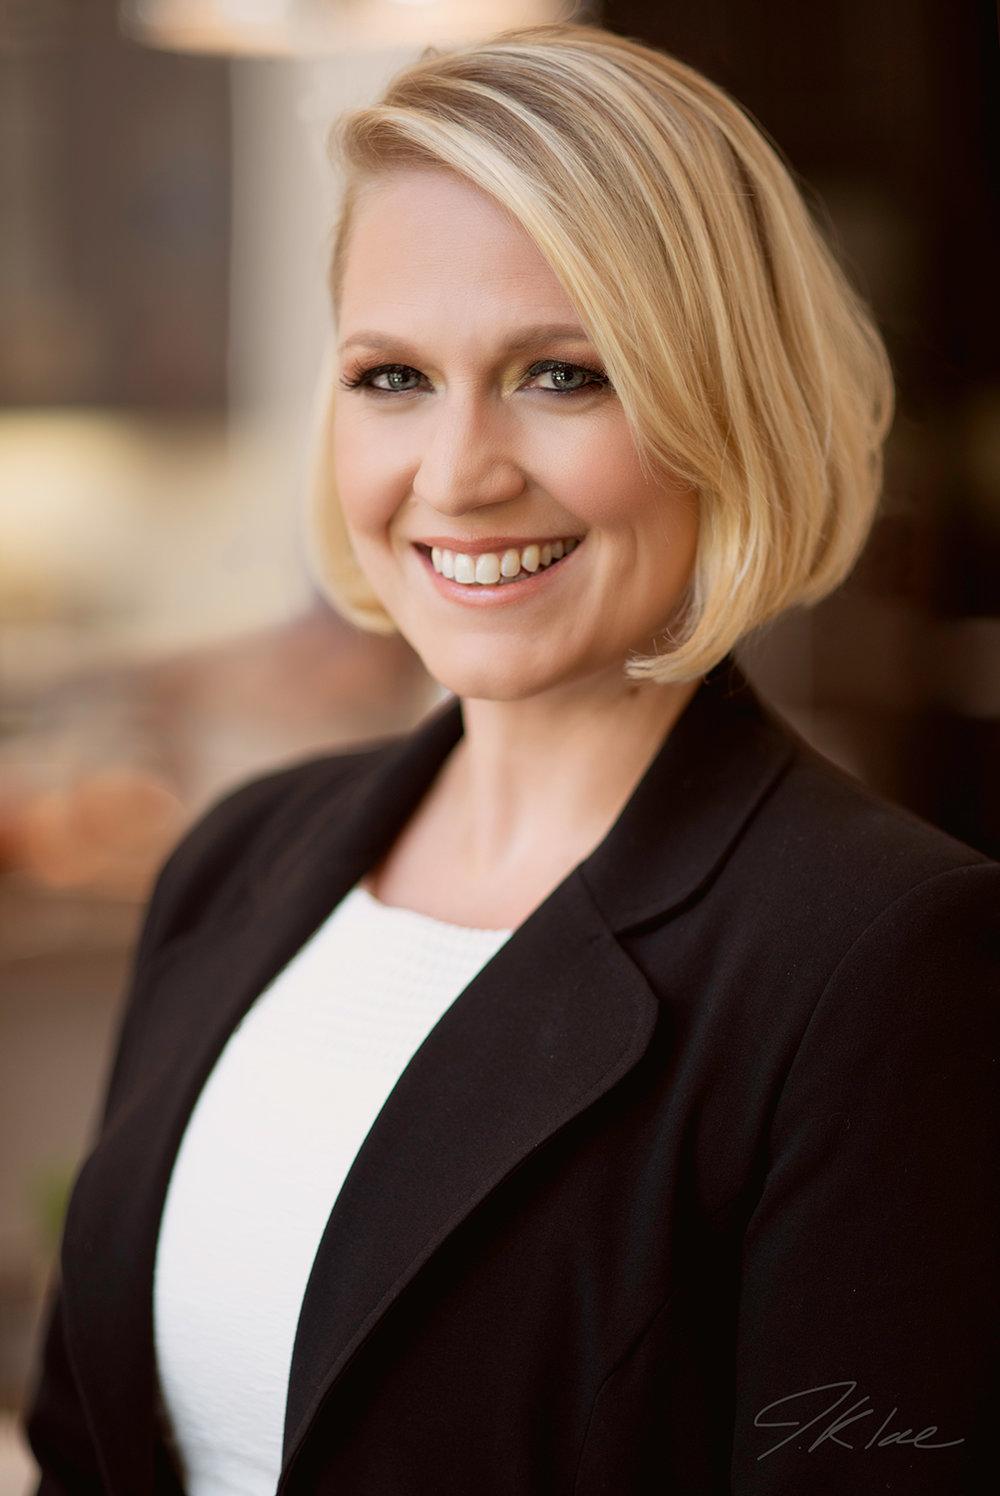 Professional Headshot of Female Dallas Lawyer Smiling